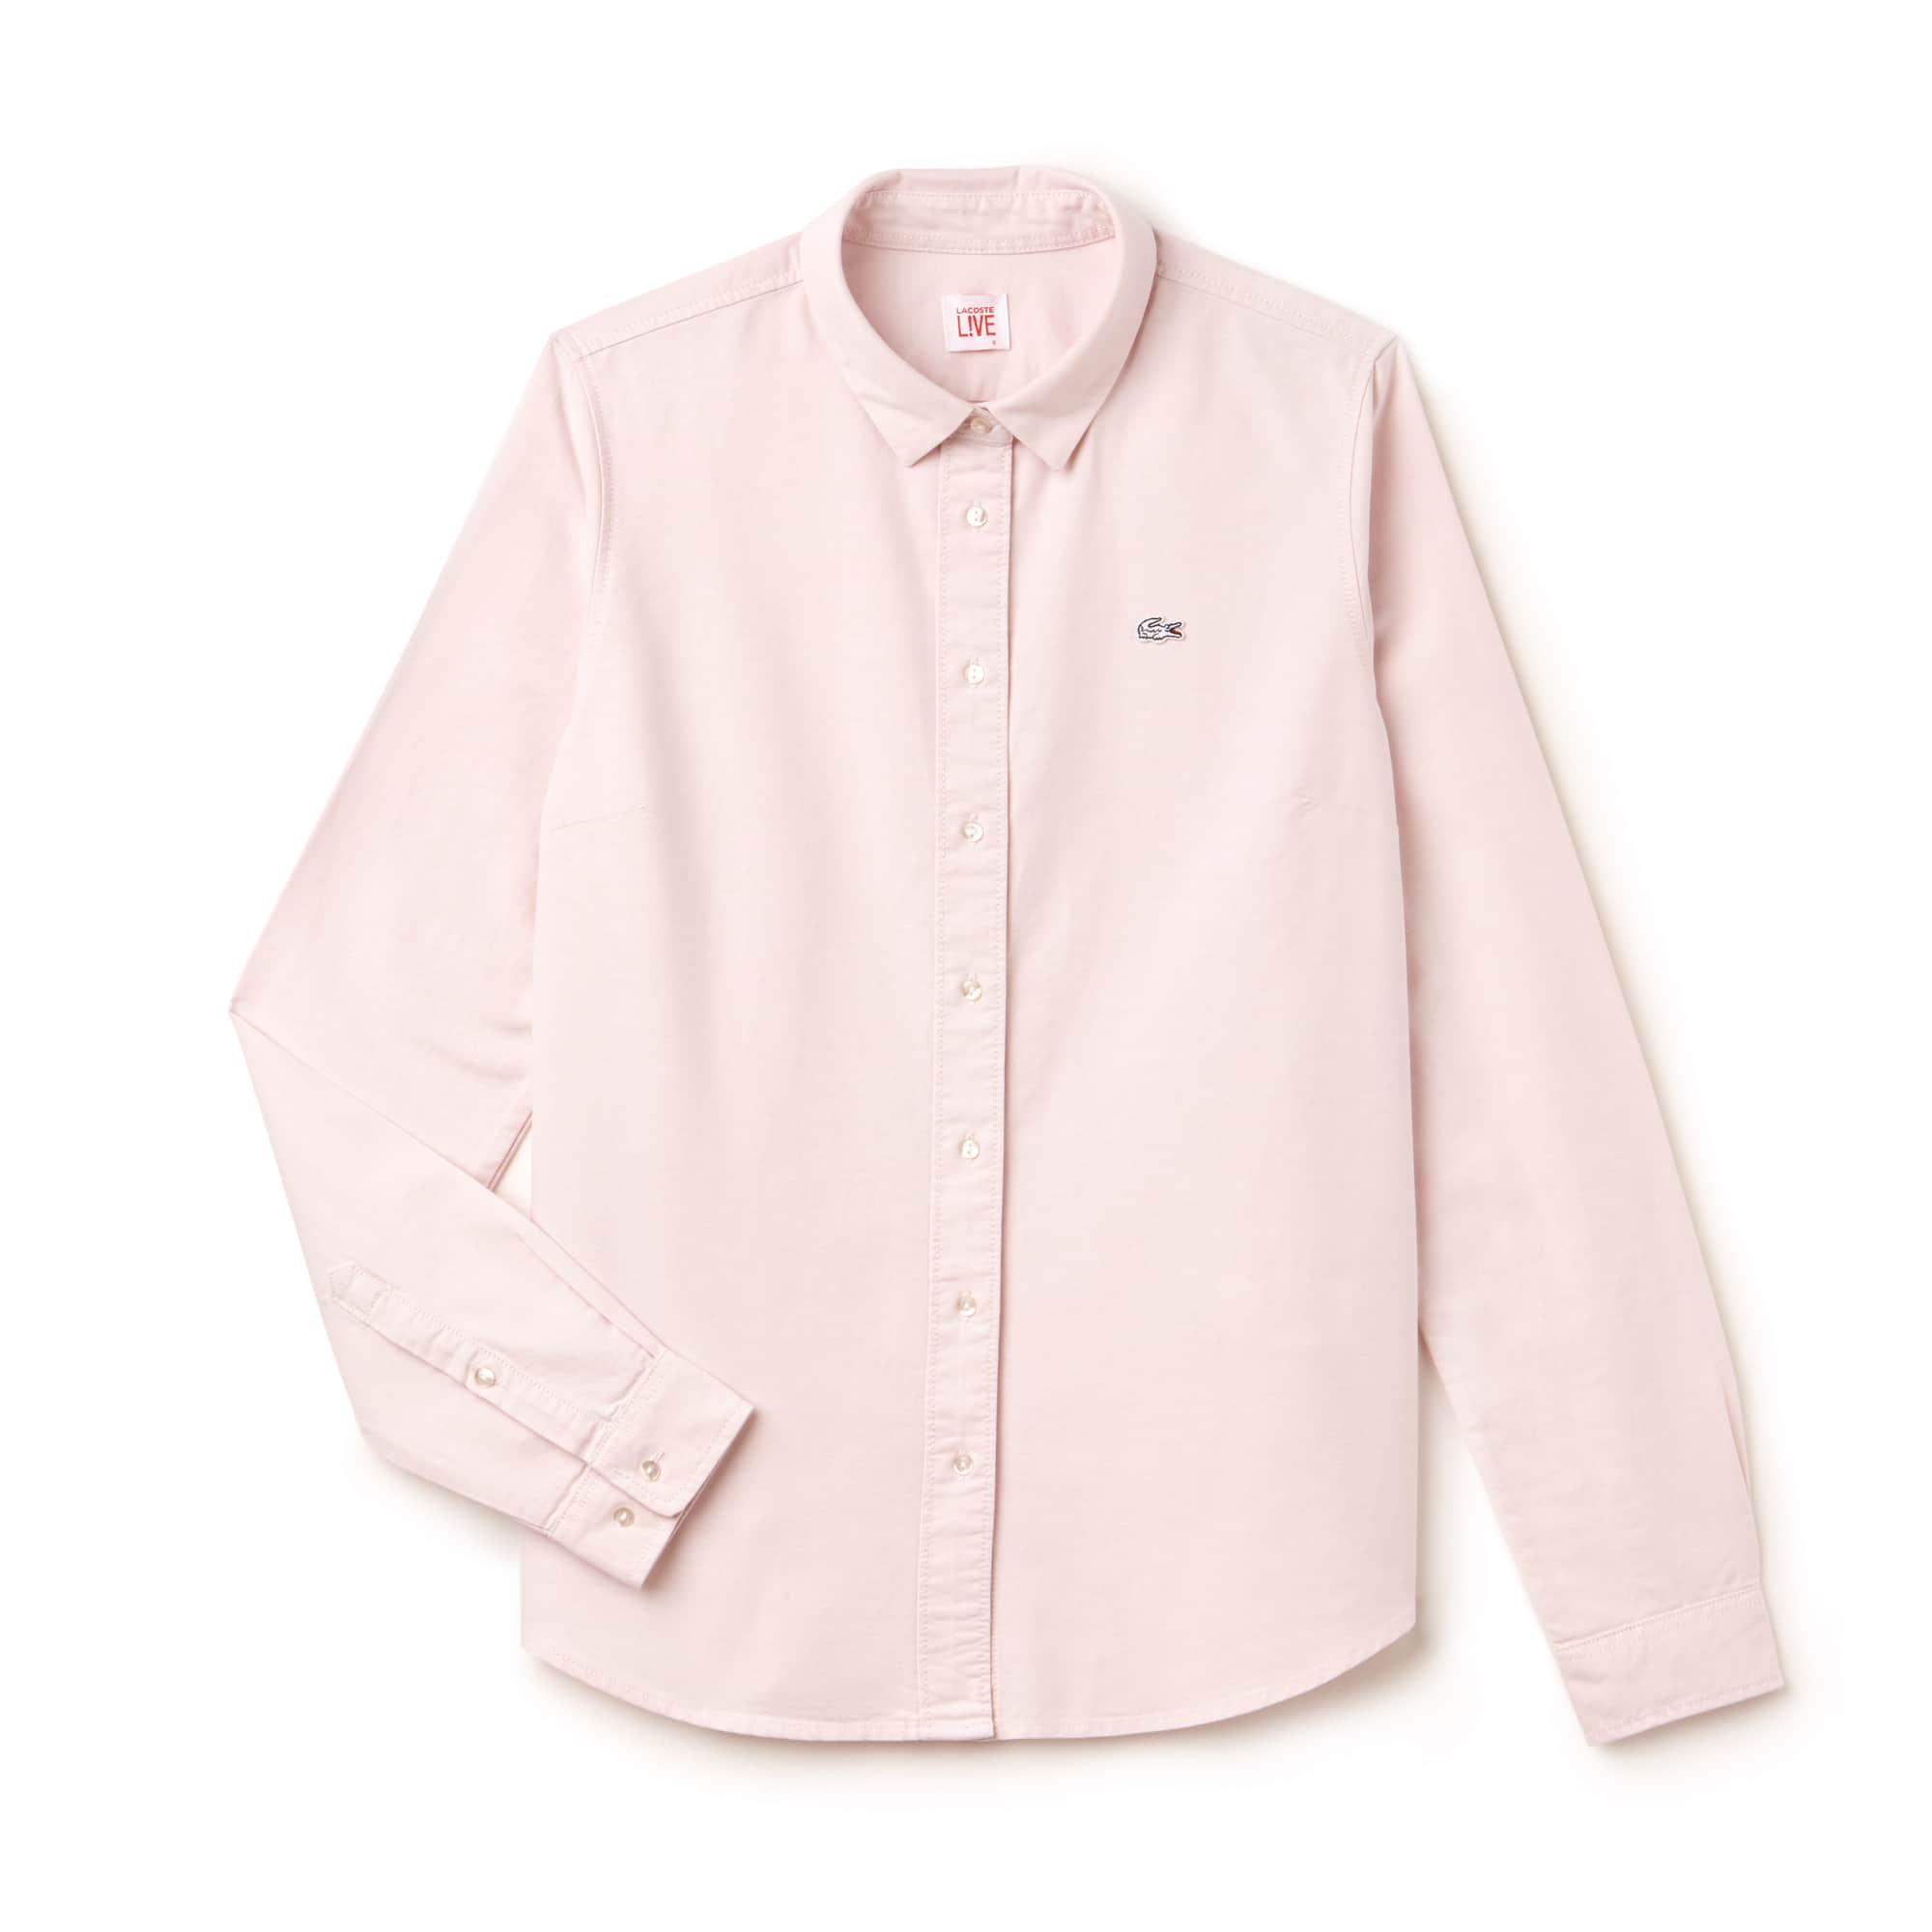 Slim Fit Damen-Hemd aus Oxford-Baumwolle LACOSTE L!VE